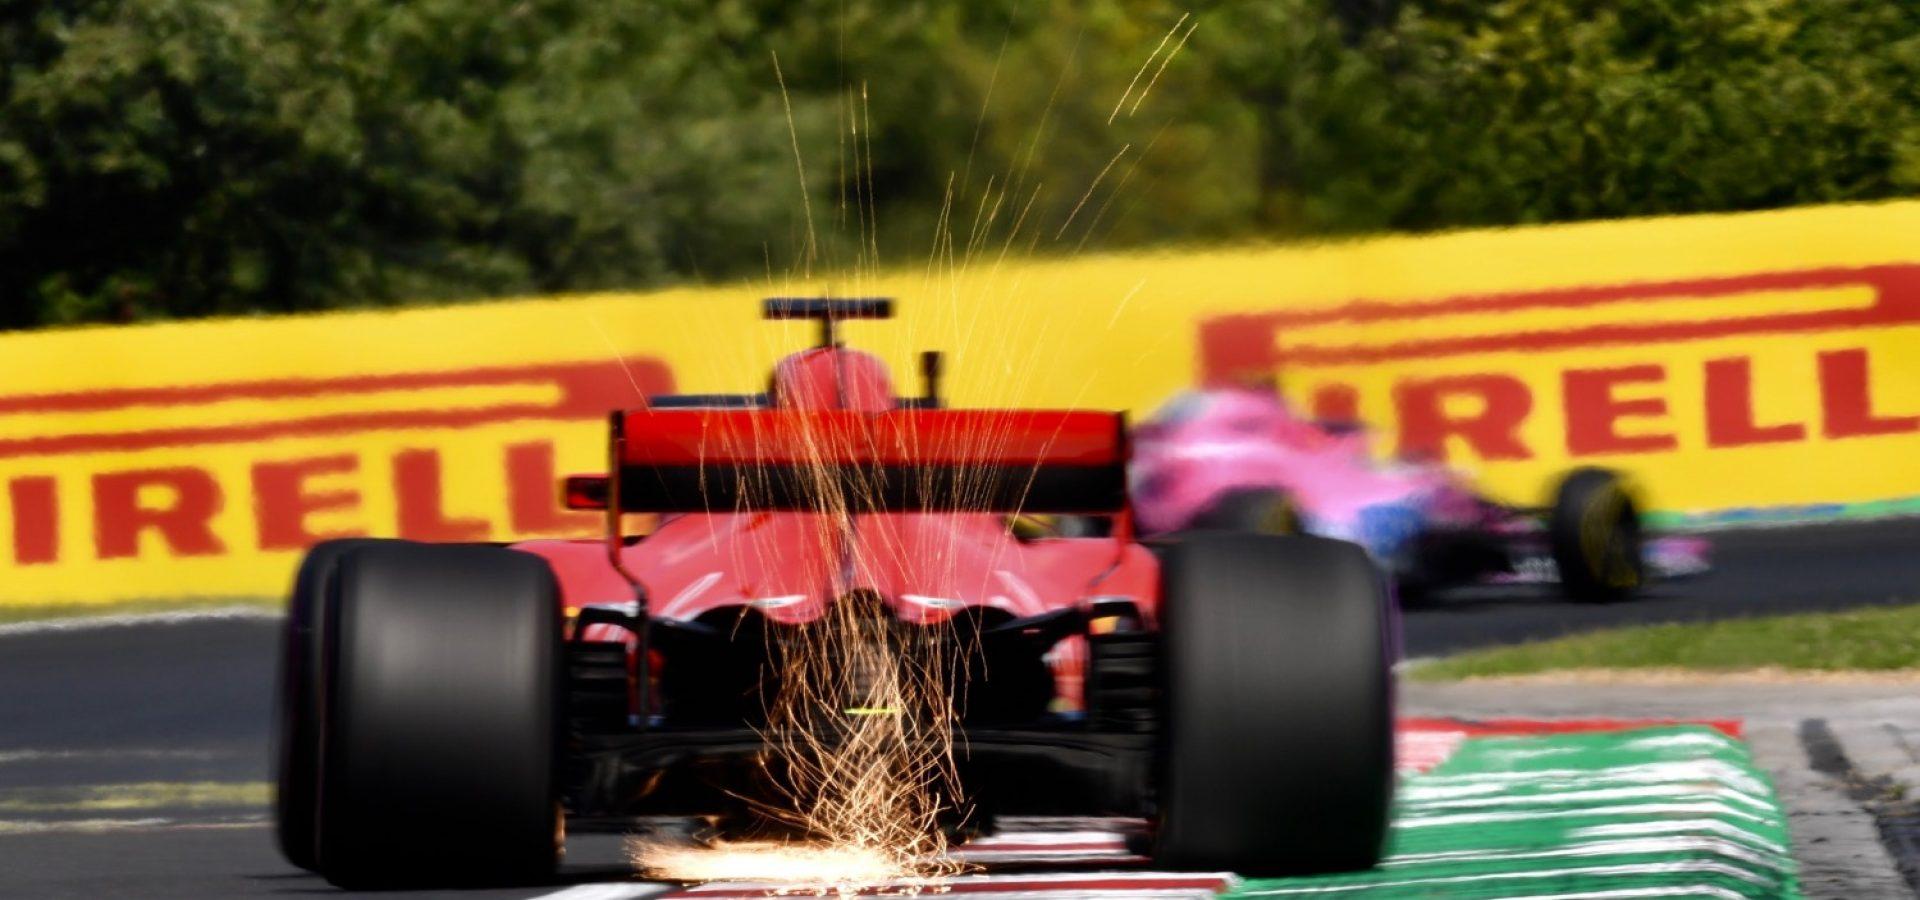 HUNGARORING, HUNGARY - JULY 27: Sebastian Vettel (GER) Ferrari SF-71H sparks during the Hungarian GP at Hungaroring on July 27, 2018 in Hungaroring, Hungary. (Photo by Jerry Andre / Sutton Images)